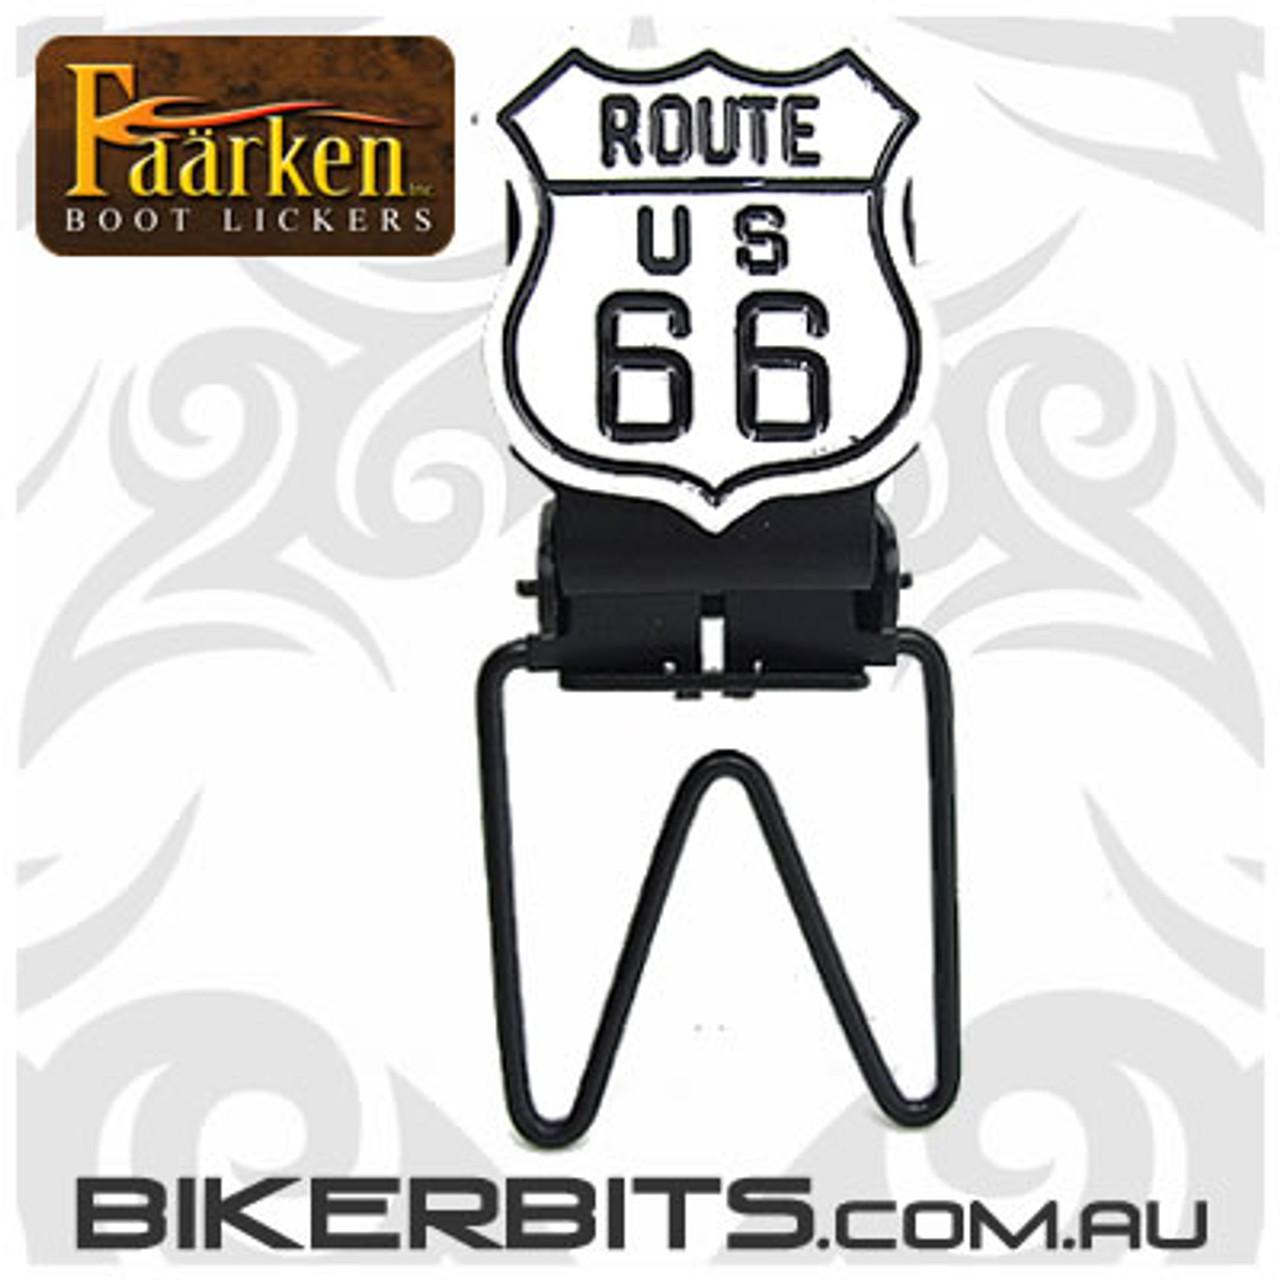 Faarken Biker Boot Lickers - Route 66 - White